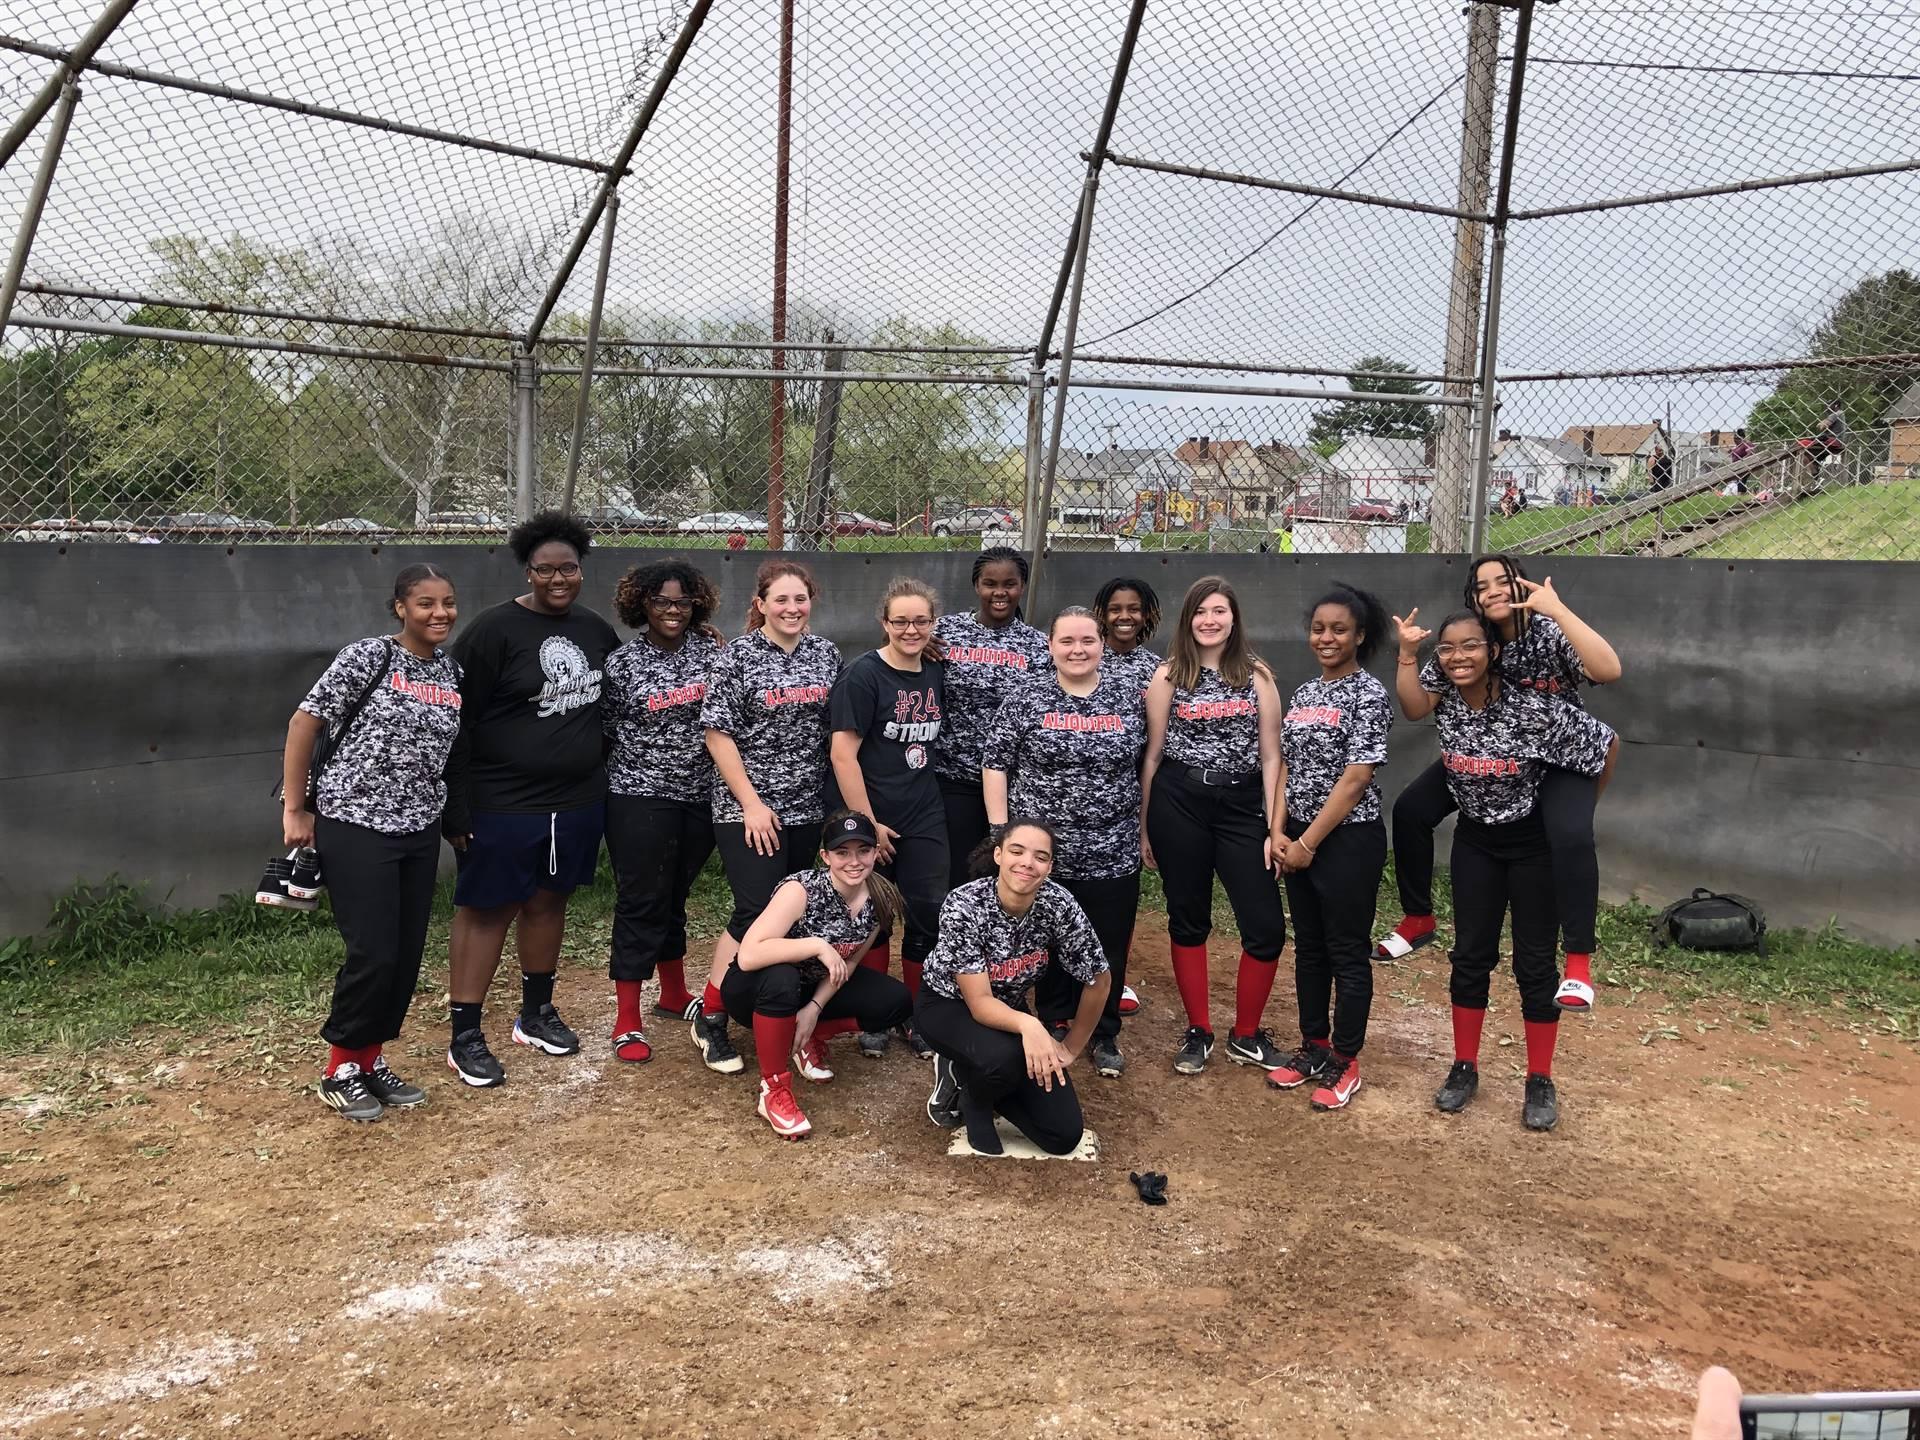 Quip Softball 2019